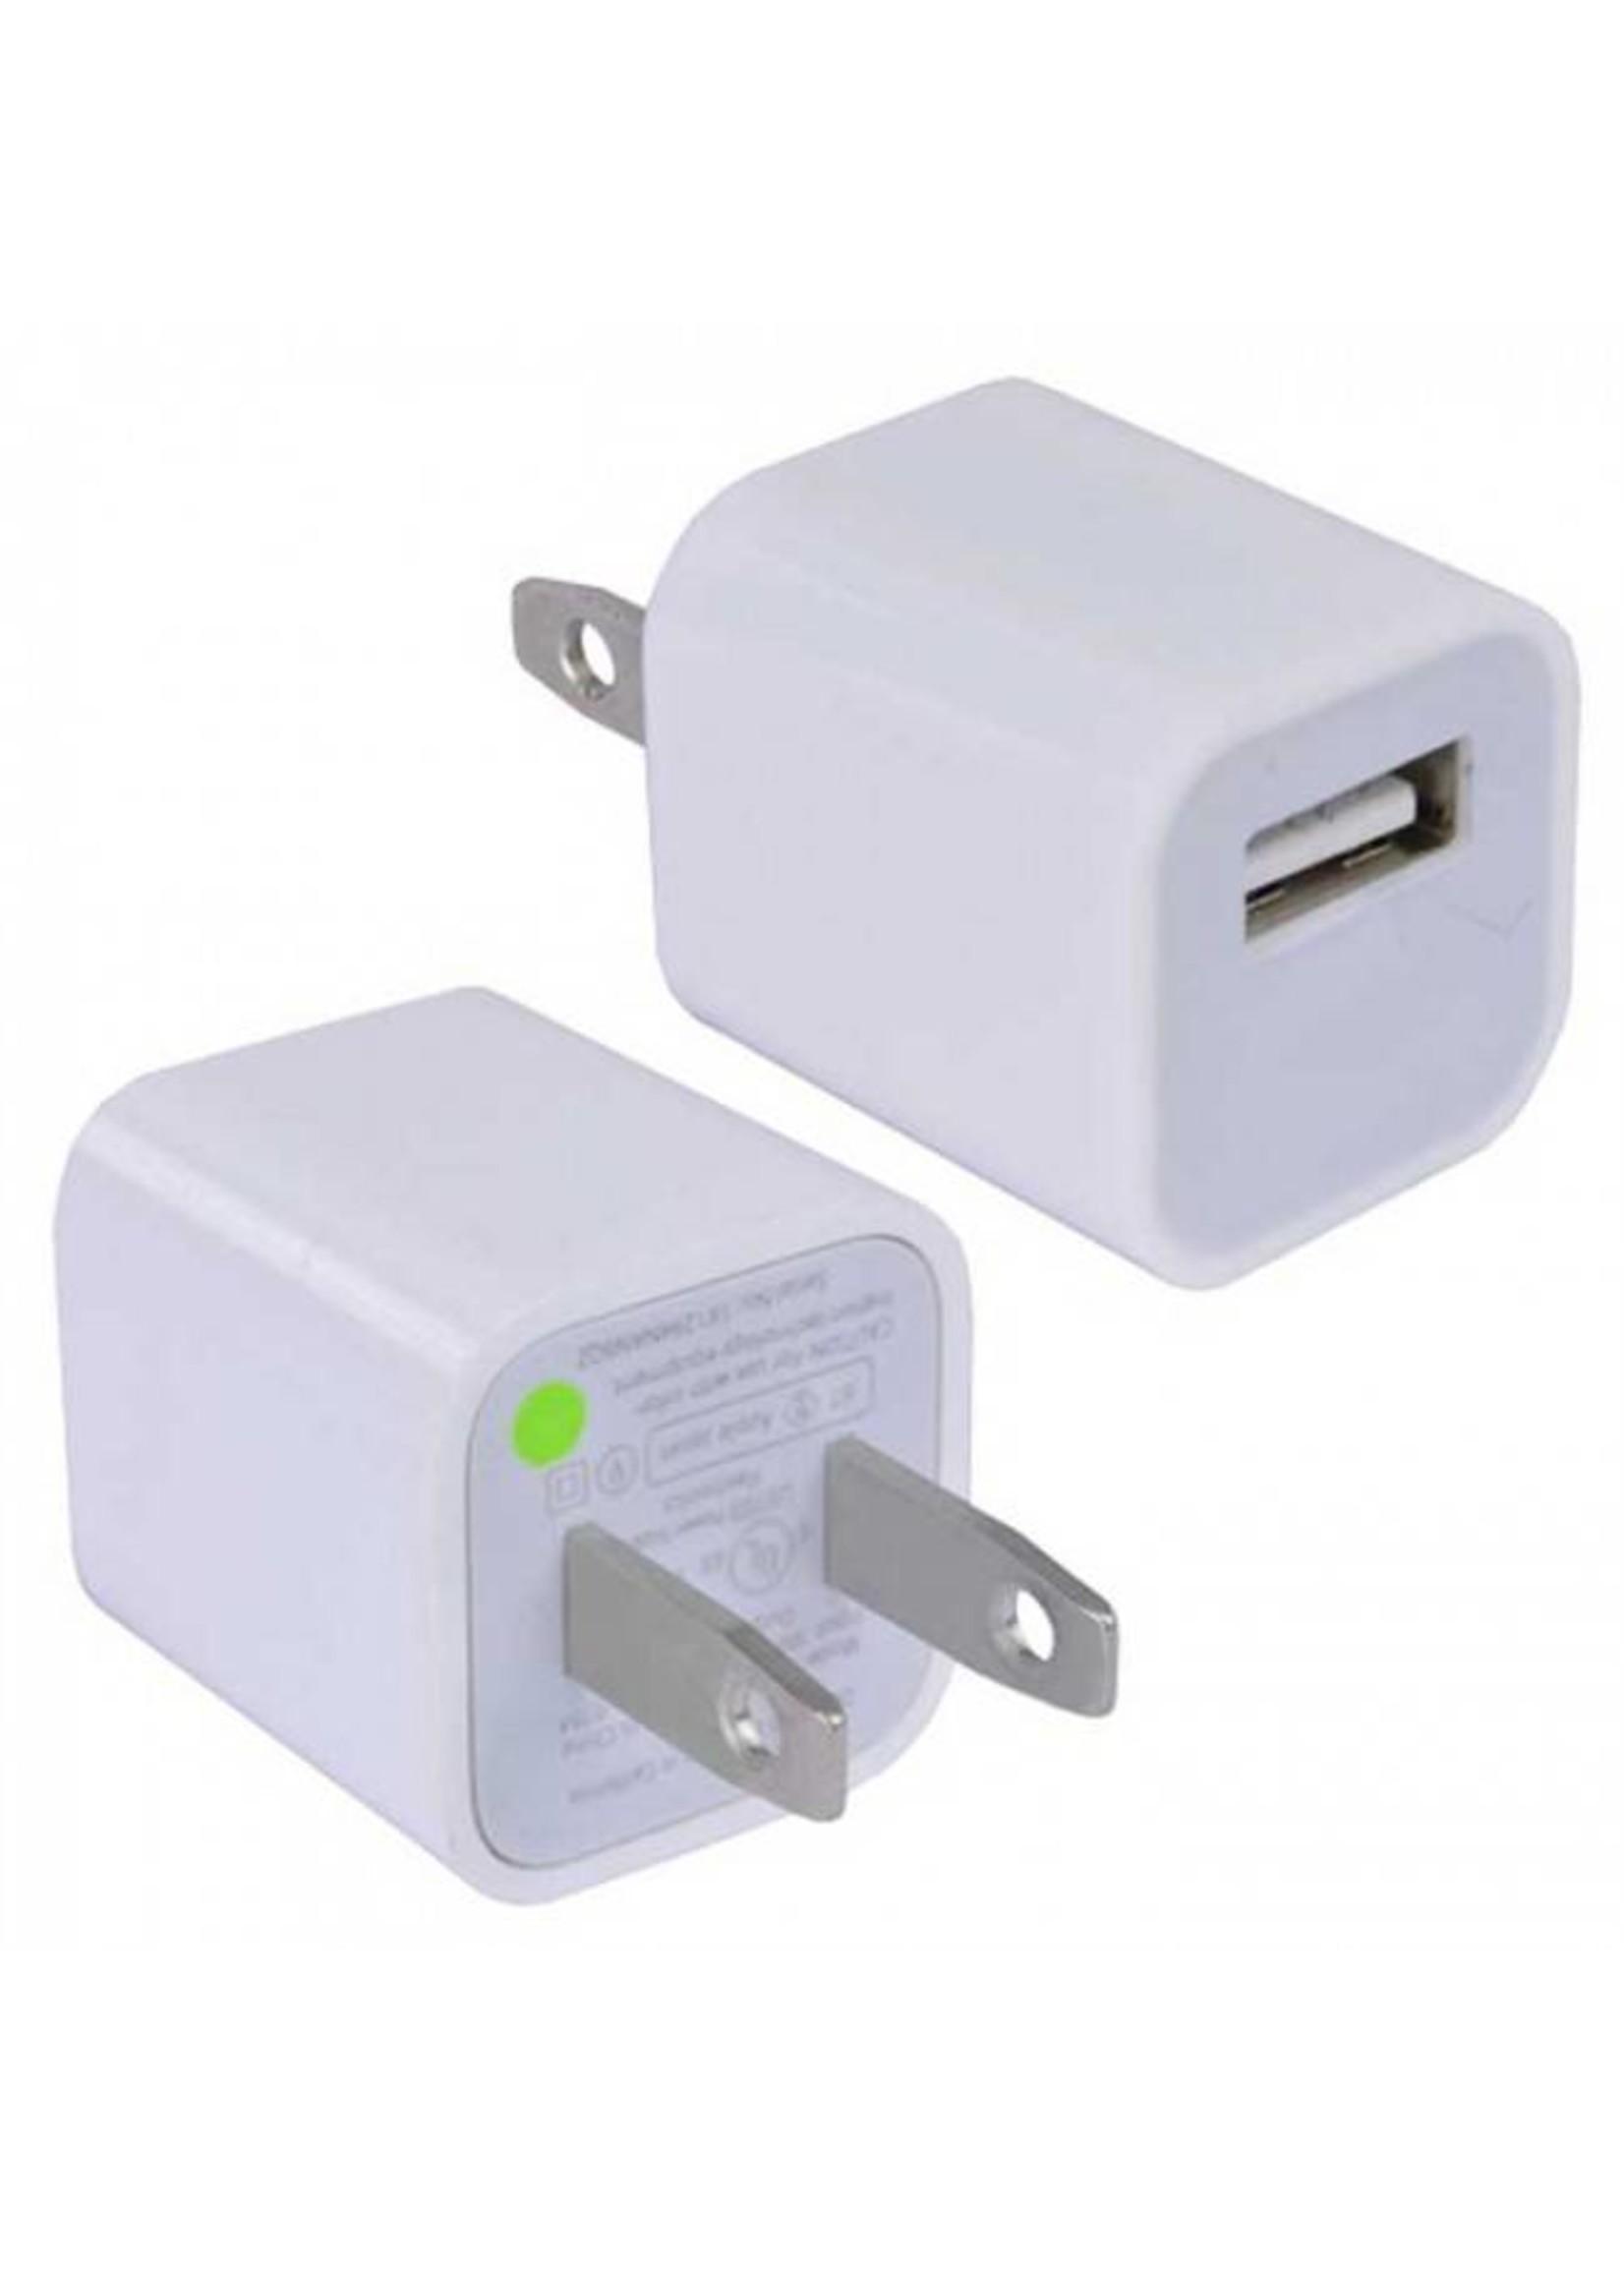 Apple Apple ORIGINAL 1A Wall Adapter